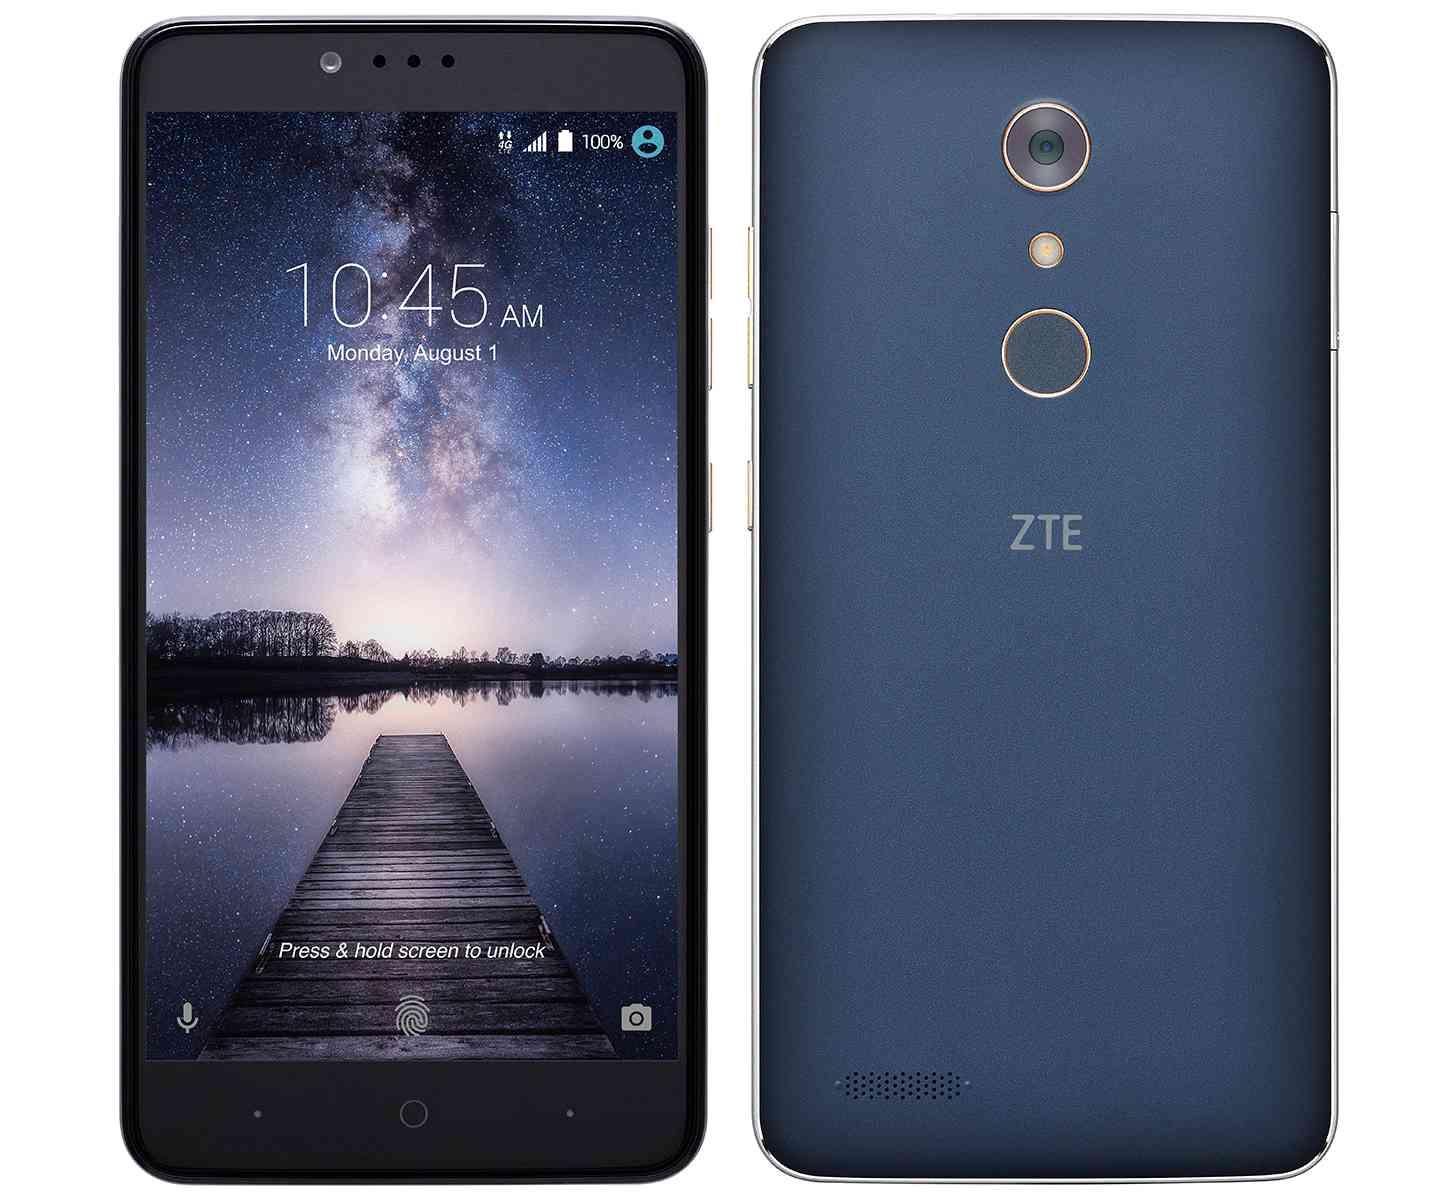 ZTE ZMax Pro T-Mobile official